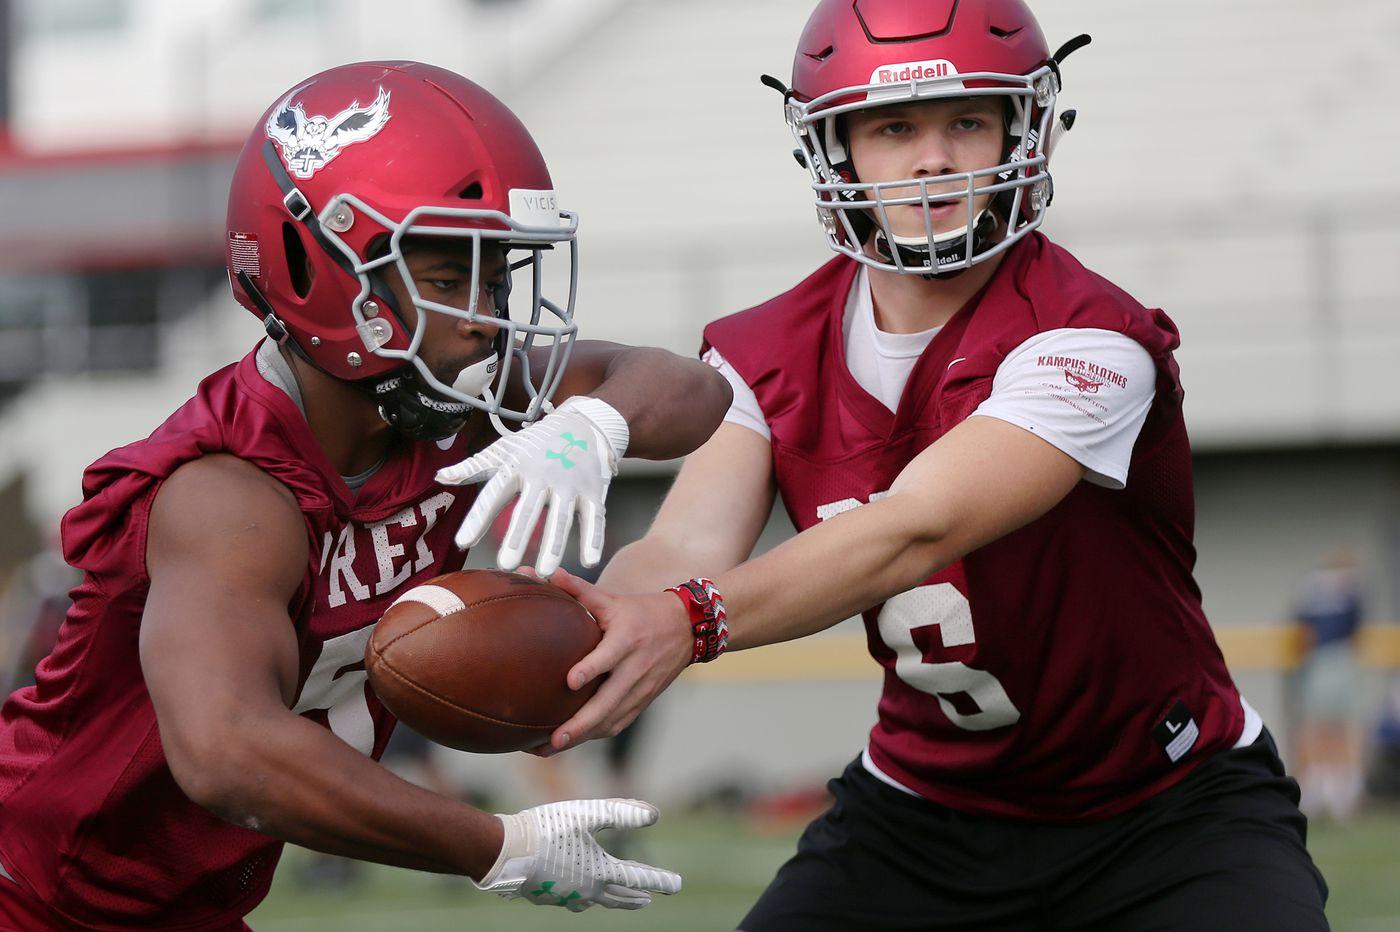 Southeastern Pa. football rankings: St. Joseph's Prep stays on top in Week 2 Top 10